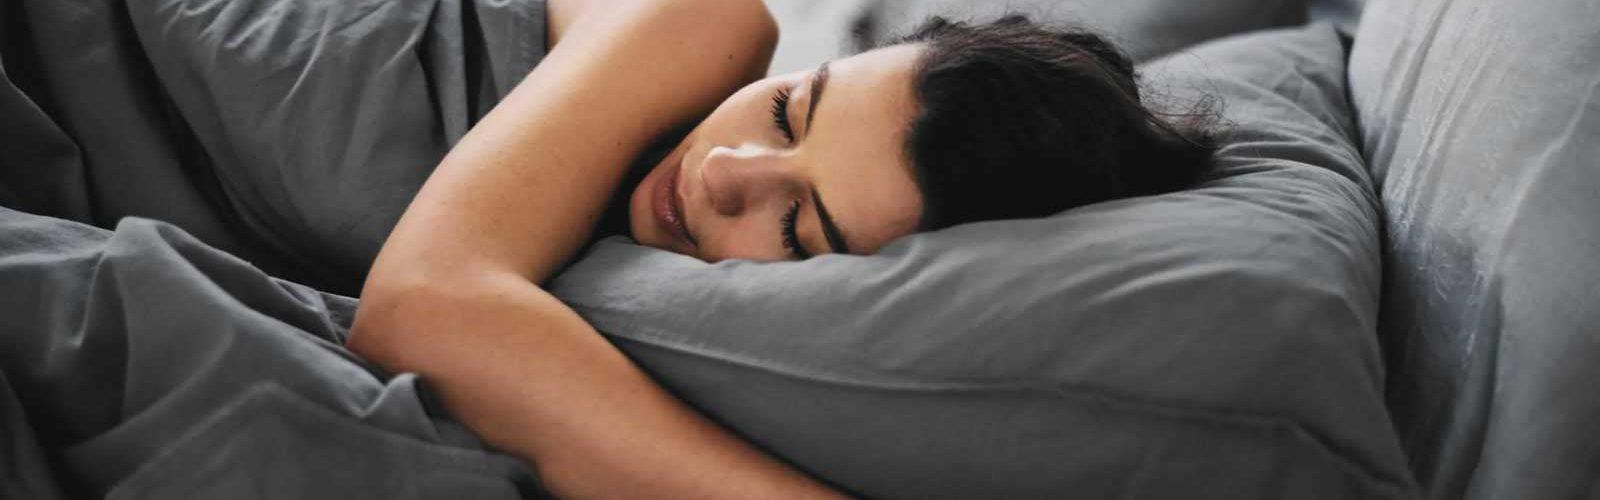 Cure a Lack of Sleep